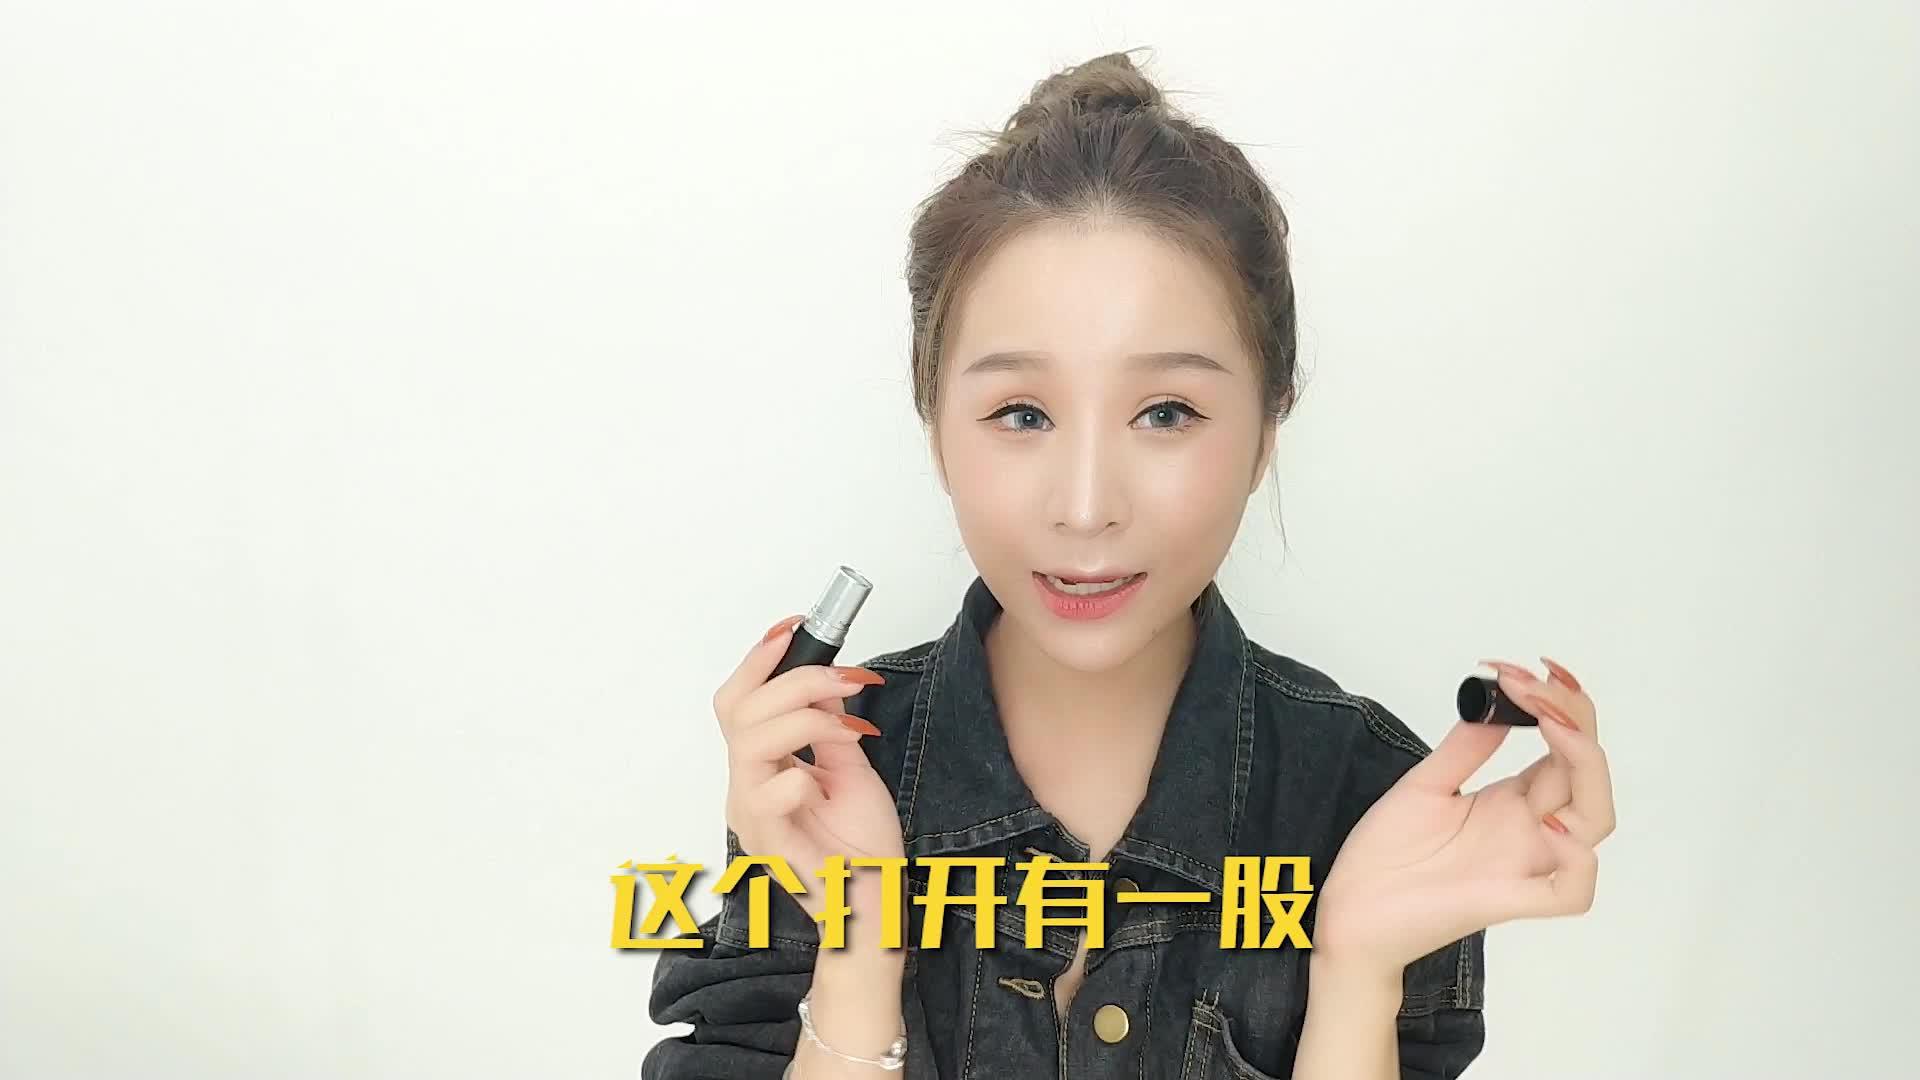 MYG 낮은 MOQ 도매 전용 라벨 메이크업 방수 매트 립스틱 30 + 색상